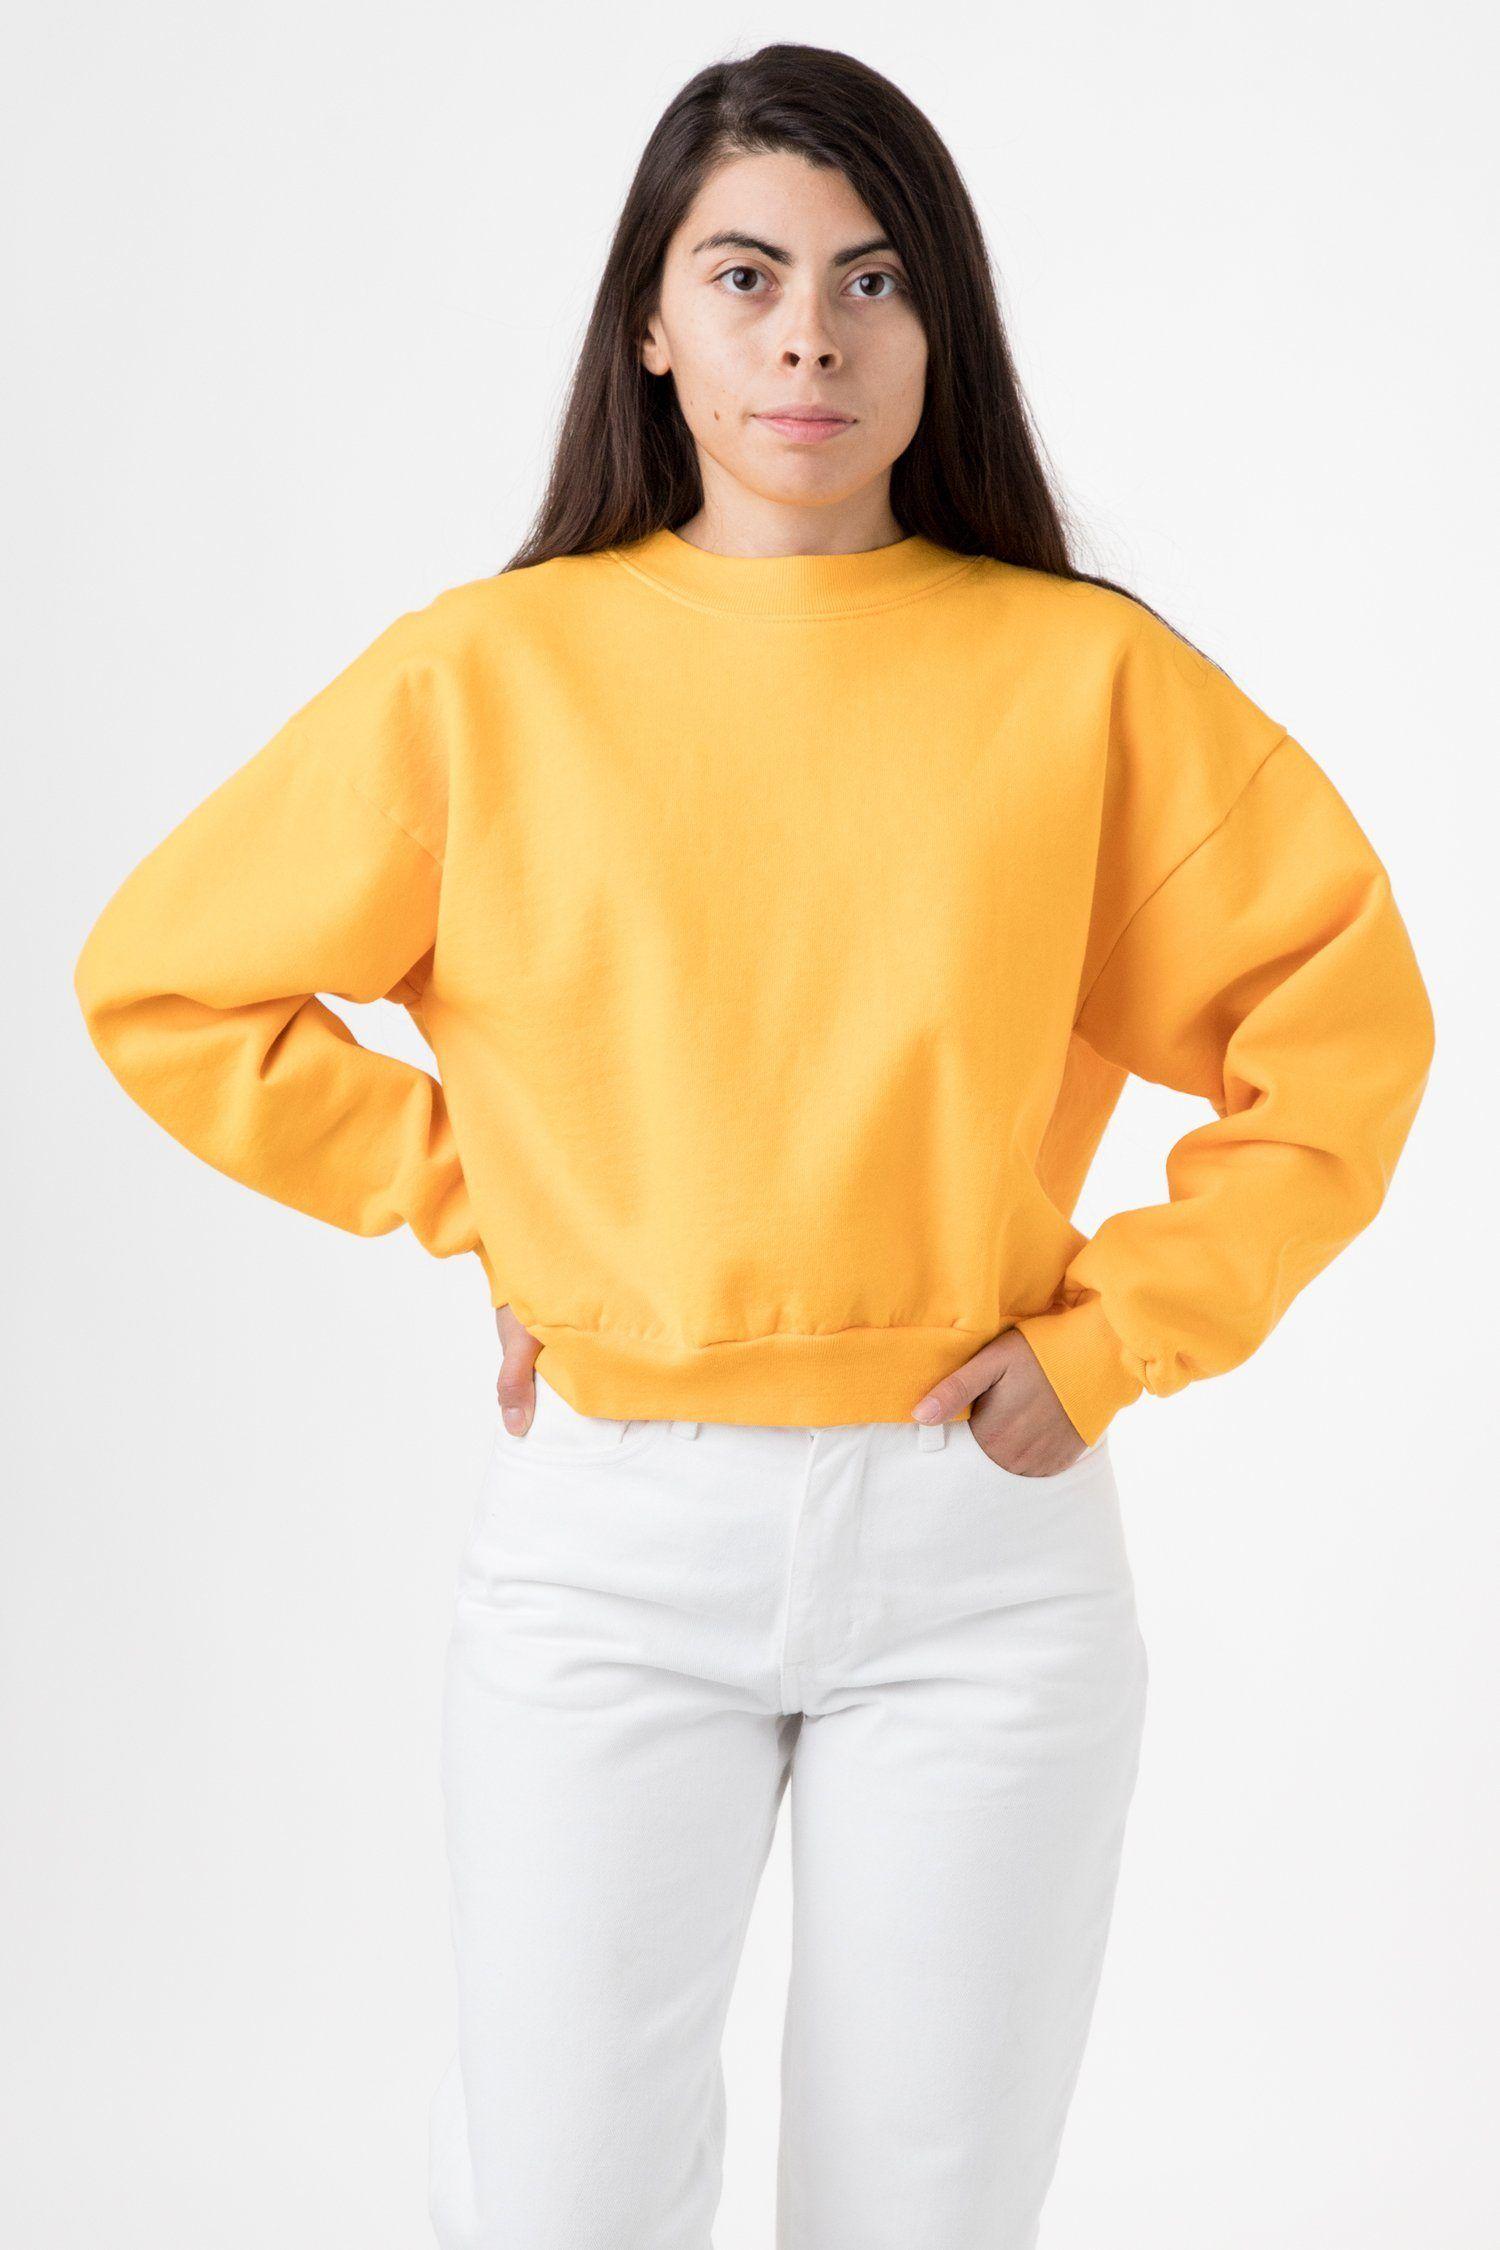 Hf06gd 14 Oz Garment Dye Heavy Fleece Cropped Mock Neck Pullover Garment Dye Garment High Waisted Pants